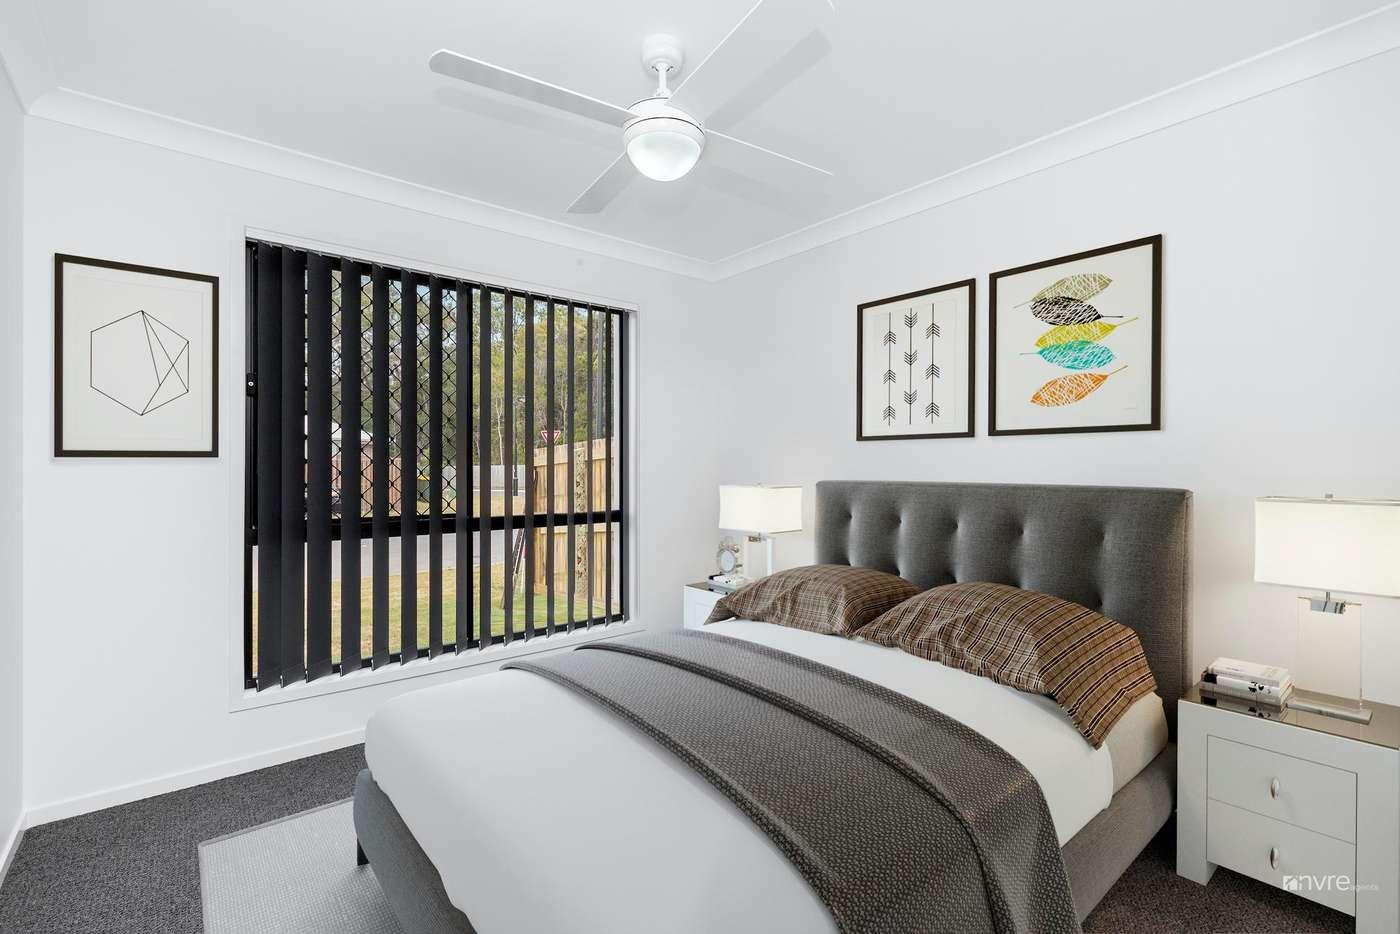 Sixth view of Homely semiDetached listing, 32 Elandra Street, Burpengary QLD 4505